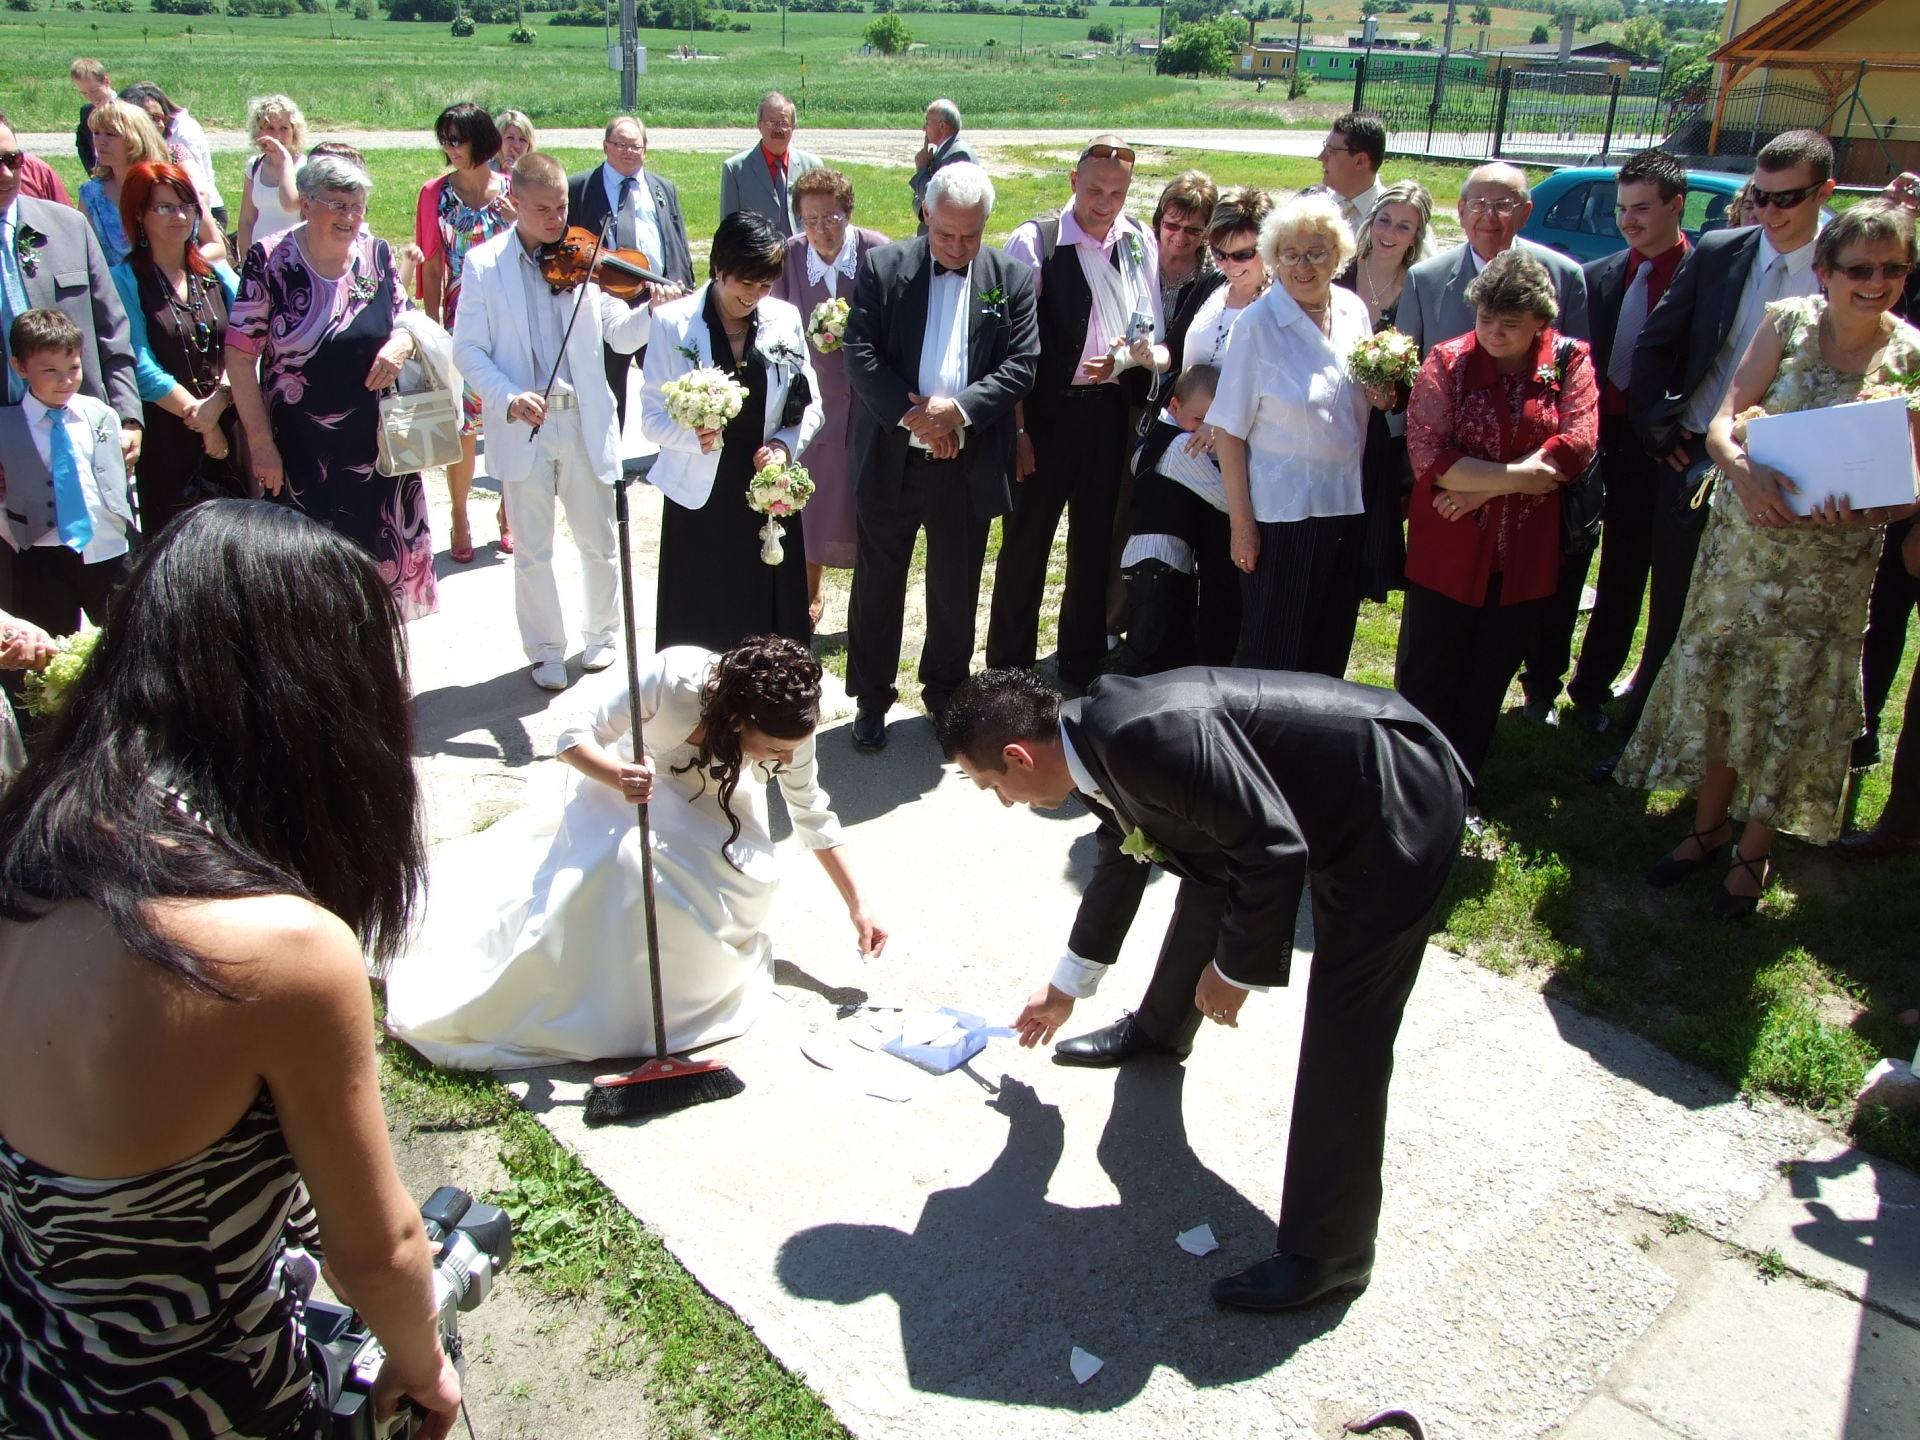 Palenicek's Wedding